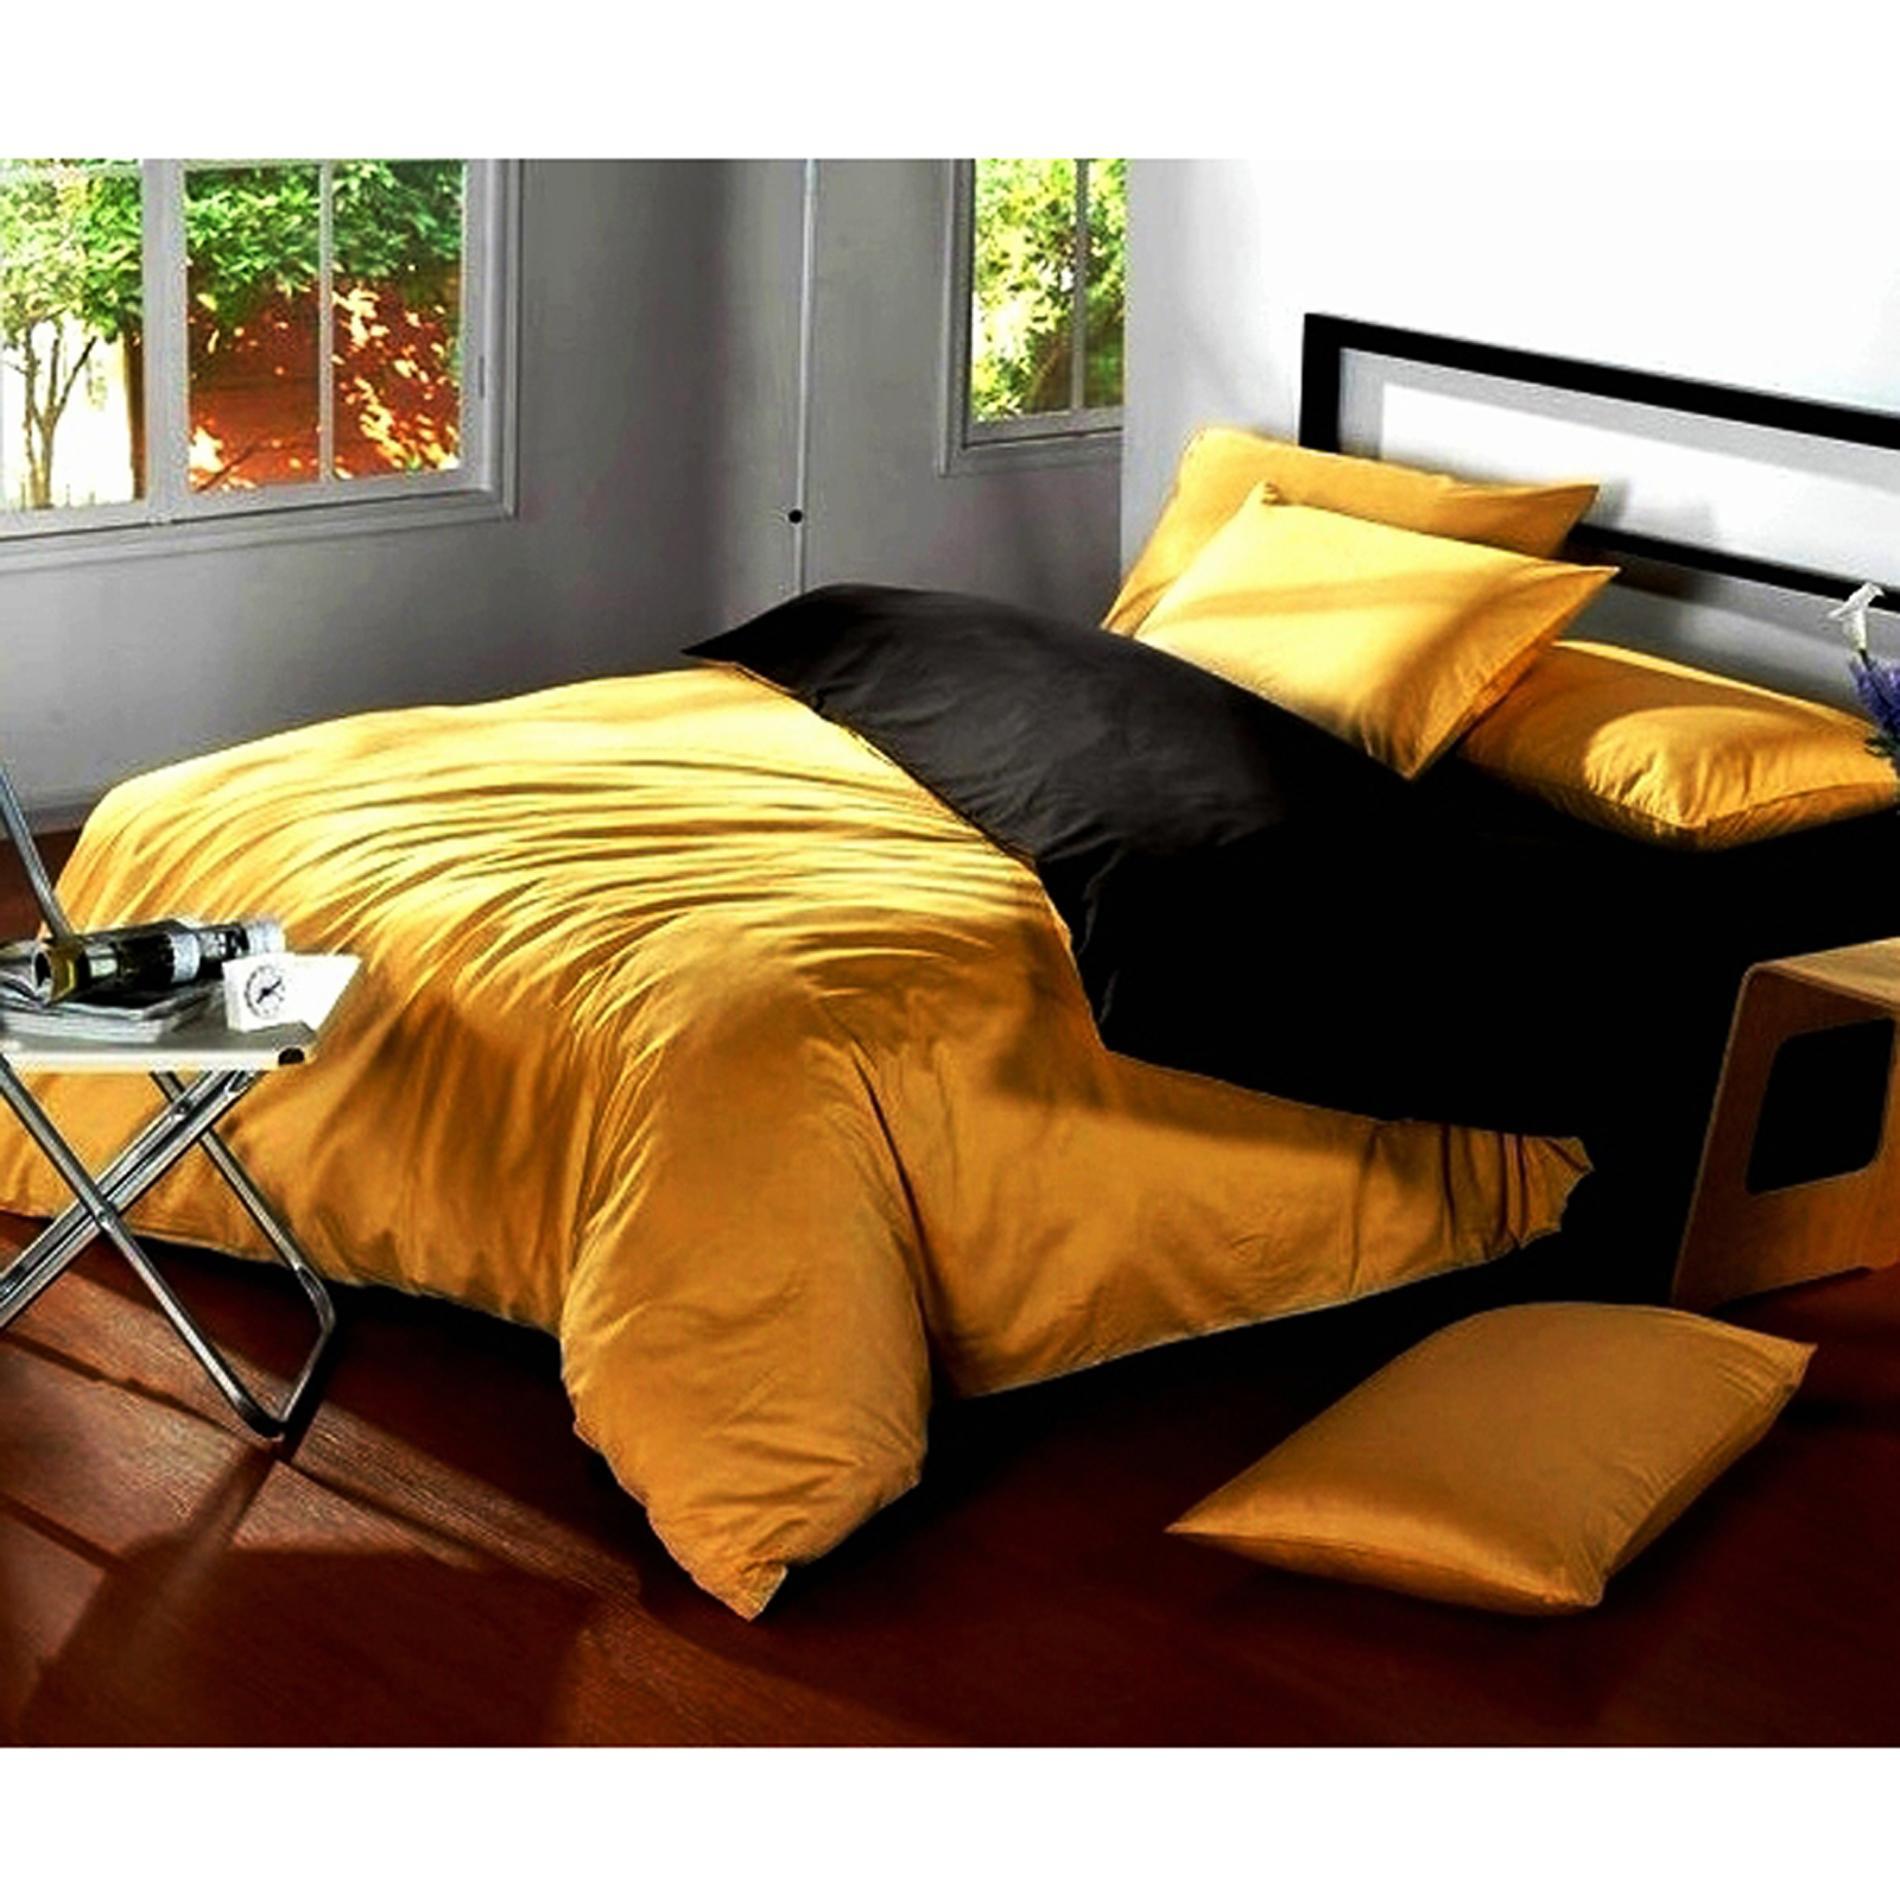 Ellenov Honey Black Sprei With Bed Cover Katun